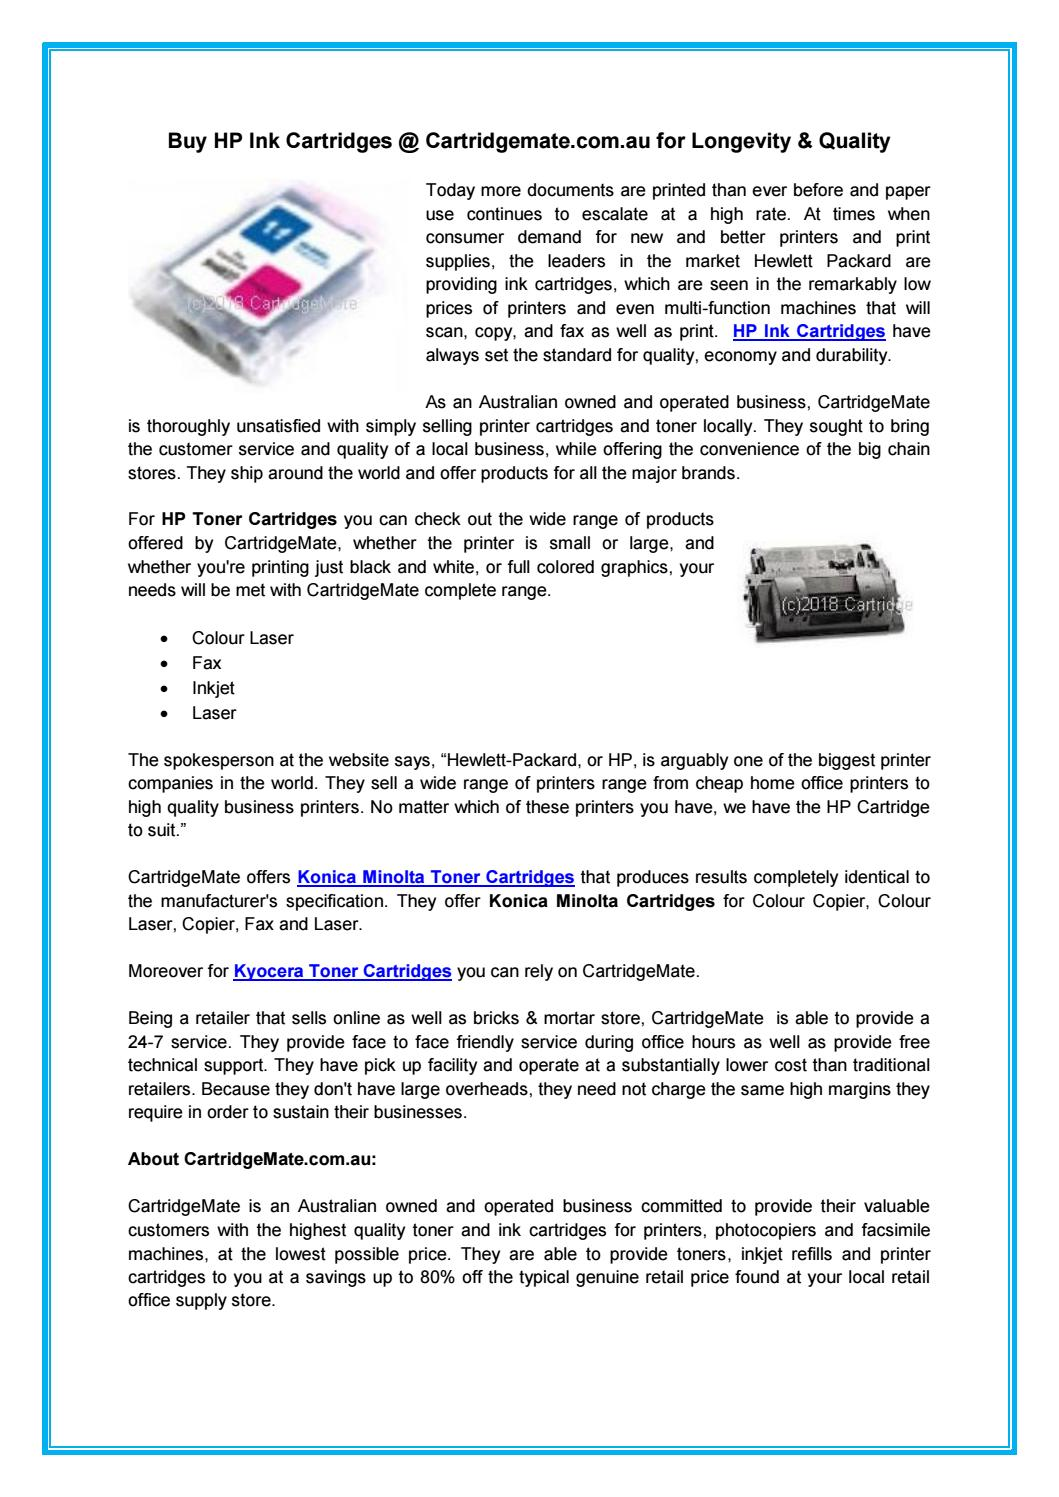 Buy HP Ink Cartridges @ Cartridgemate.com.au for Longevity & Quality ...